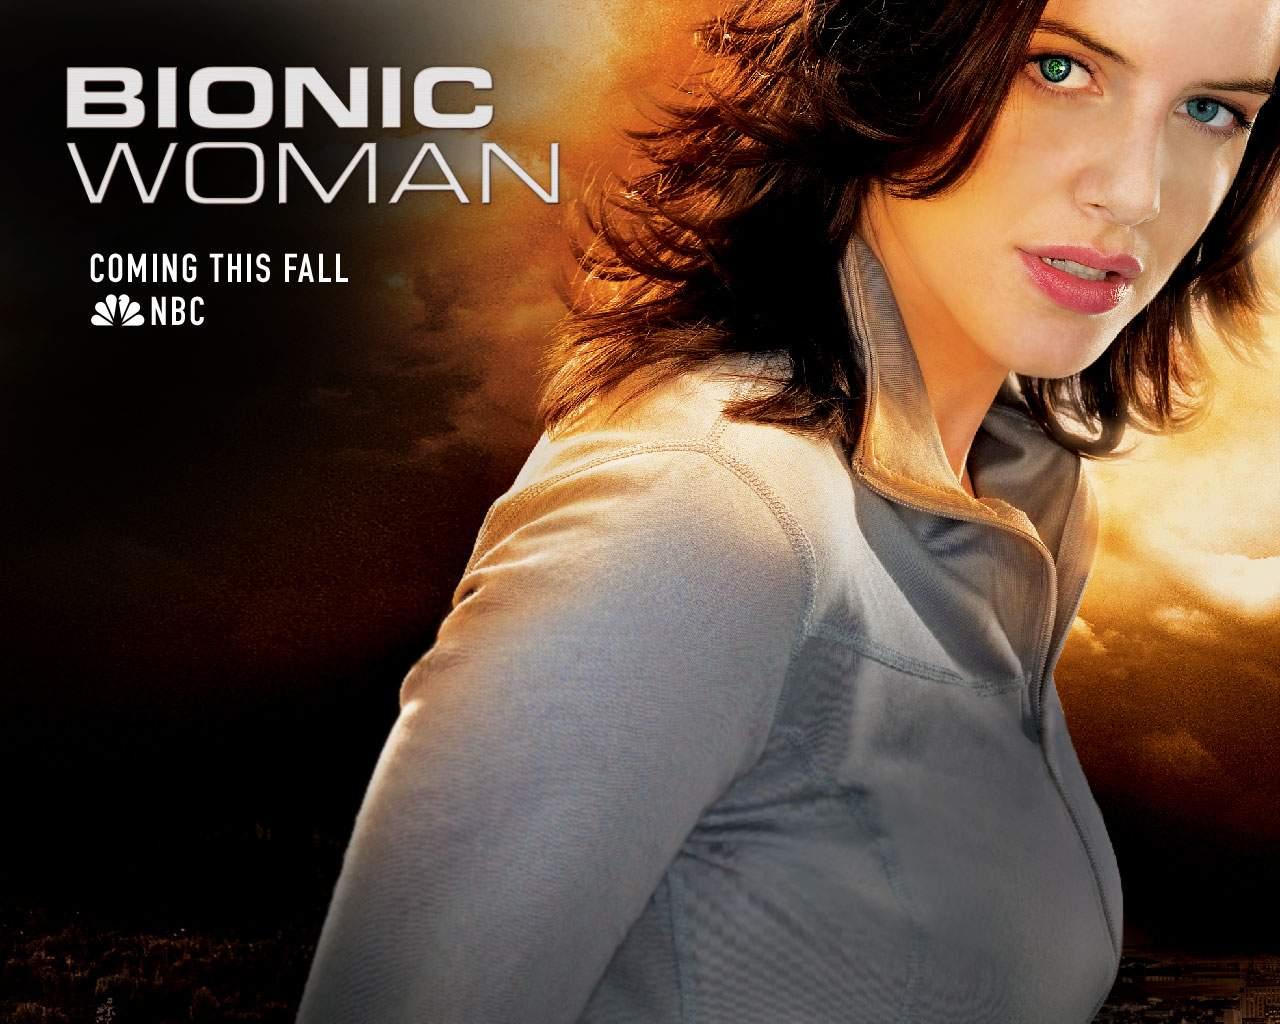 bionic_woman1.jpg